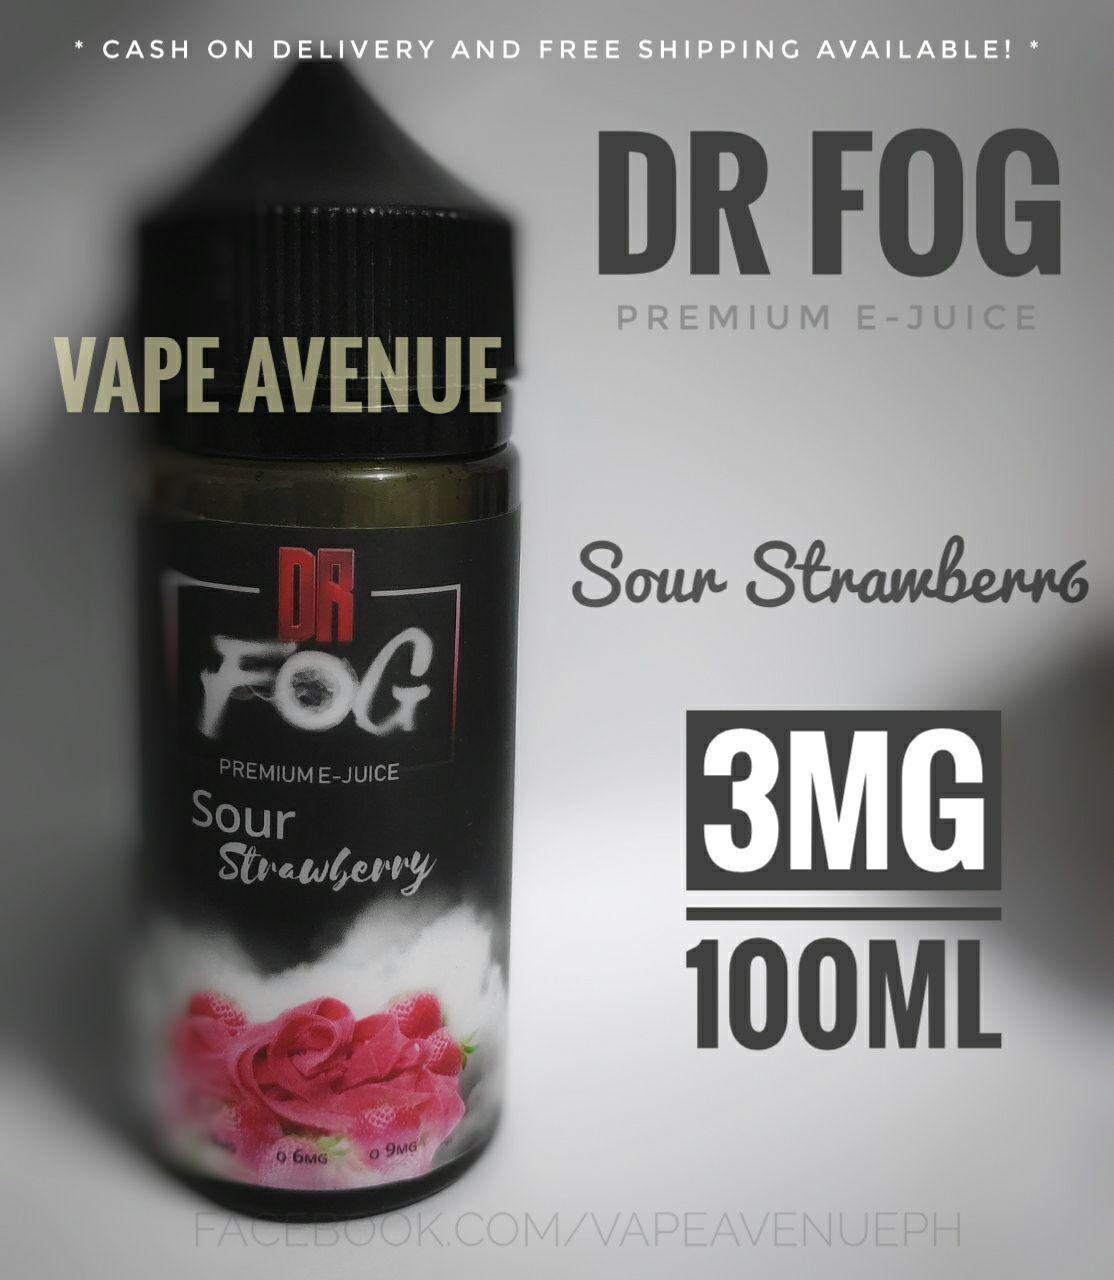 DR FOG 3MG 100ML [ Frozen Lychee / Strawberry Cheesecake / Creamy Milk /  Vanilla Soda / Cappuccino Delight / Yacold / Frozen Bazoocka / Sour